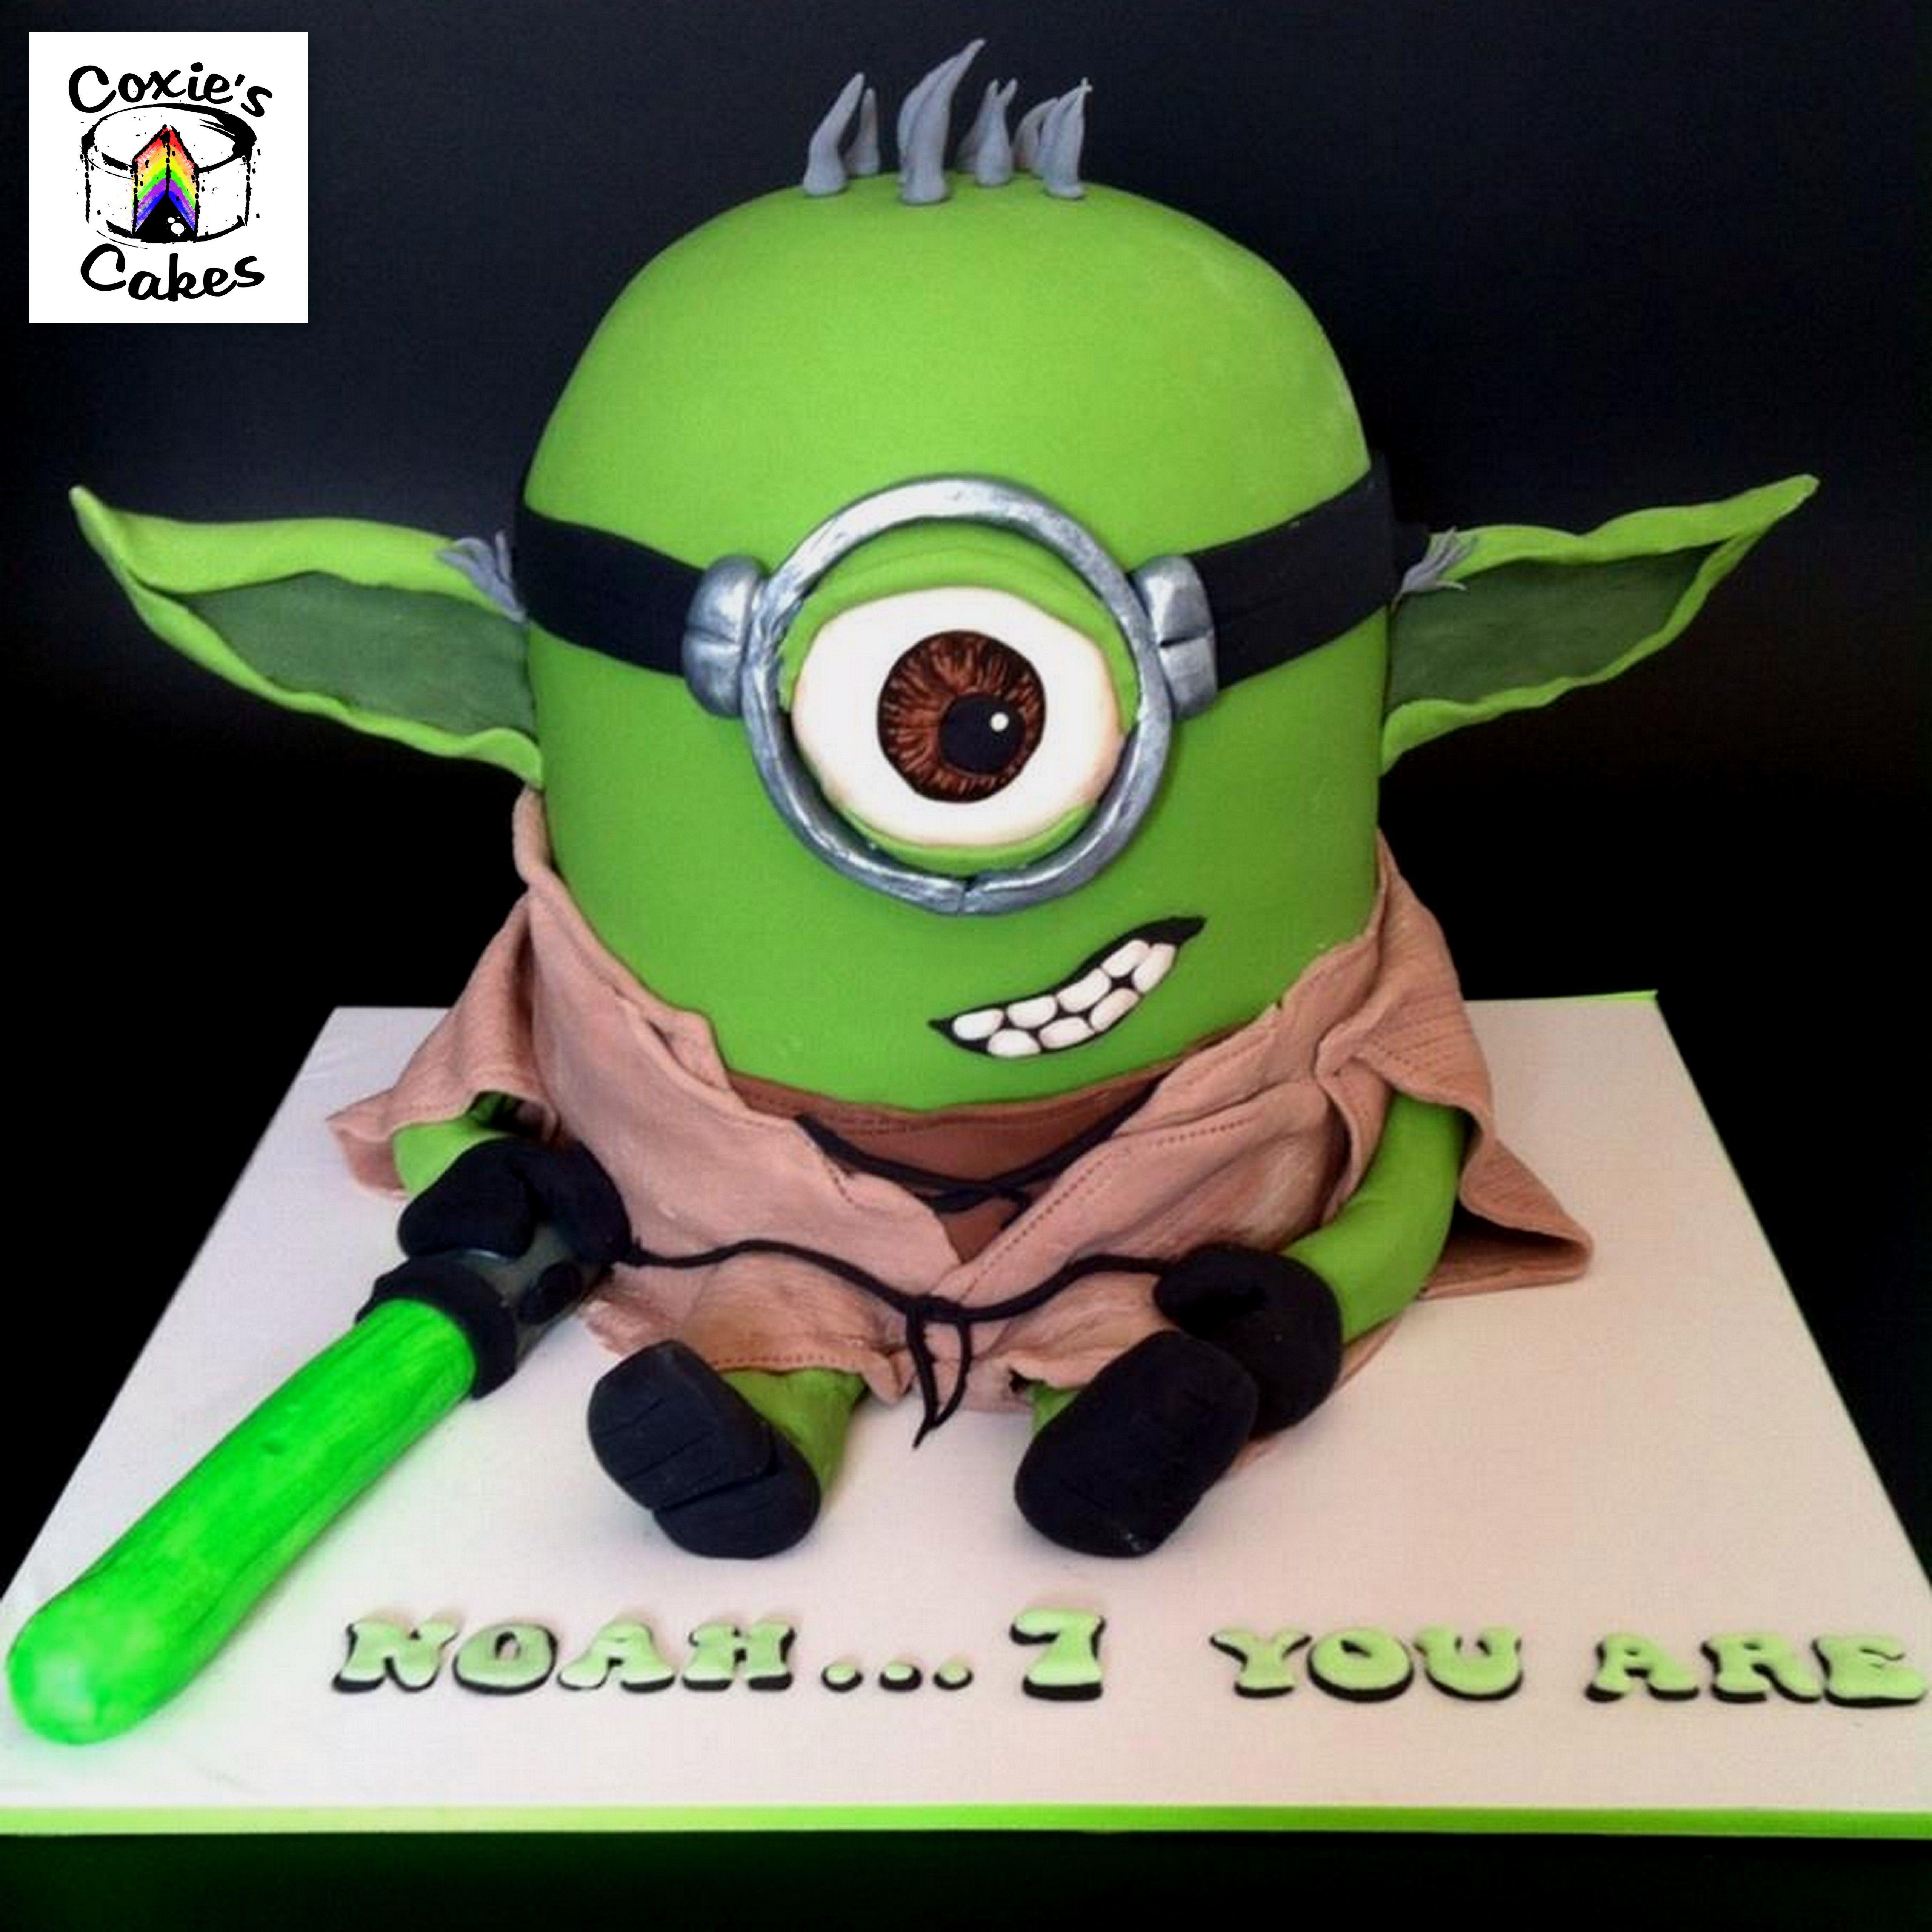 Yoda From Star Wars Minion Mashup Cake What A Super Cool